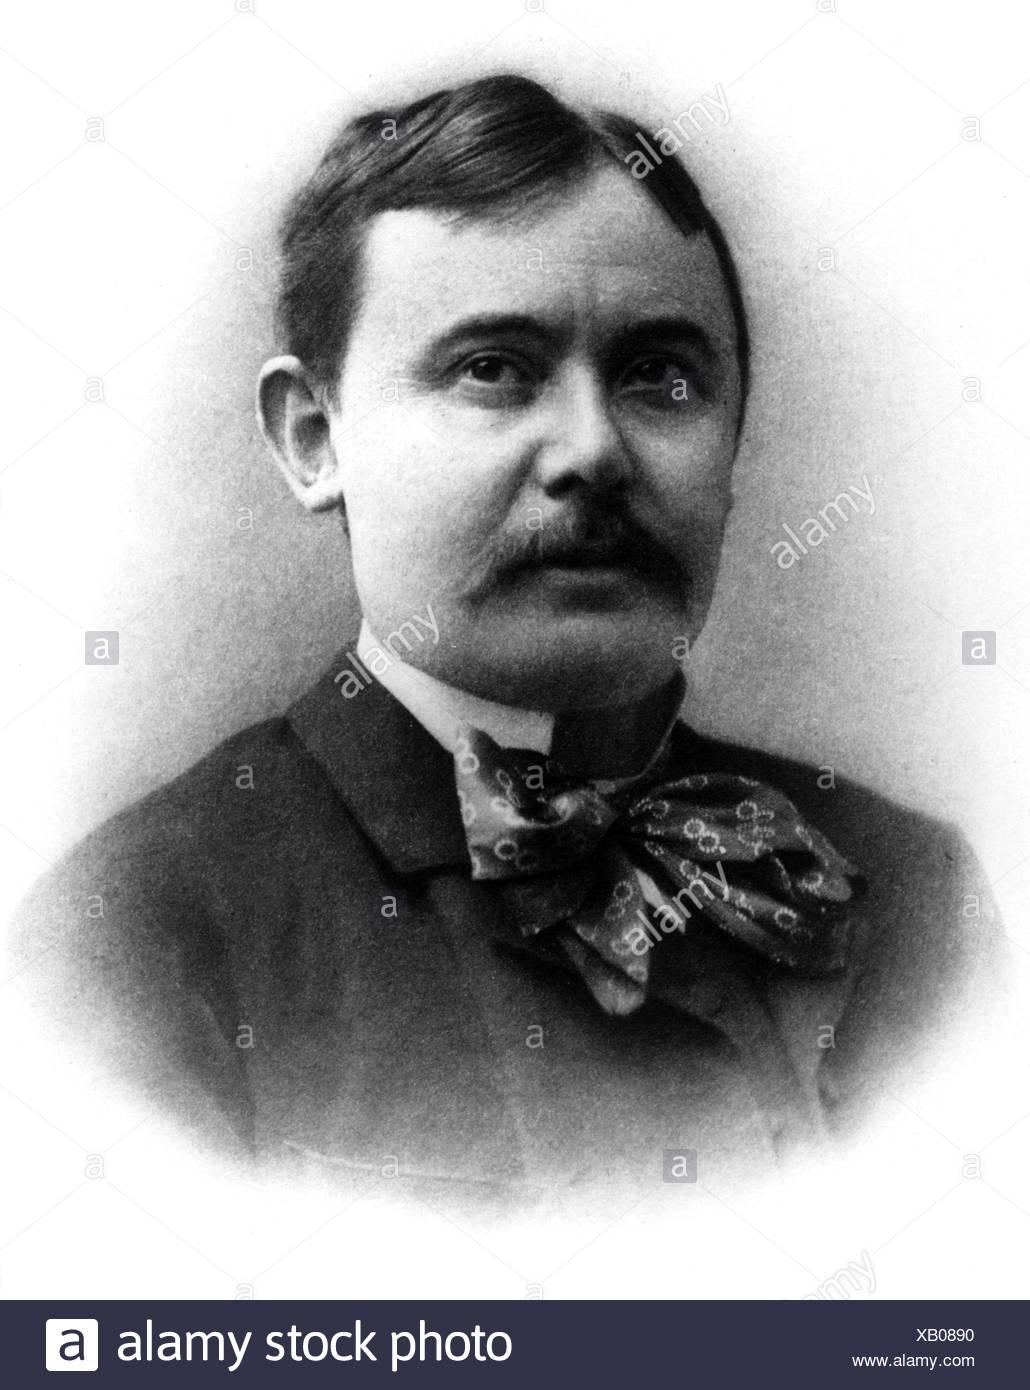 Mikszath, Kalman, 16.1.1847 - 28.5.1910, Hungarian author / writer, portrait, photograph, 1904, Additional-Rights-Clearances-NA Stock Photo